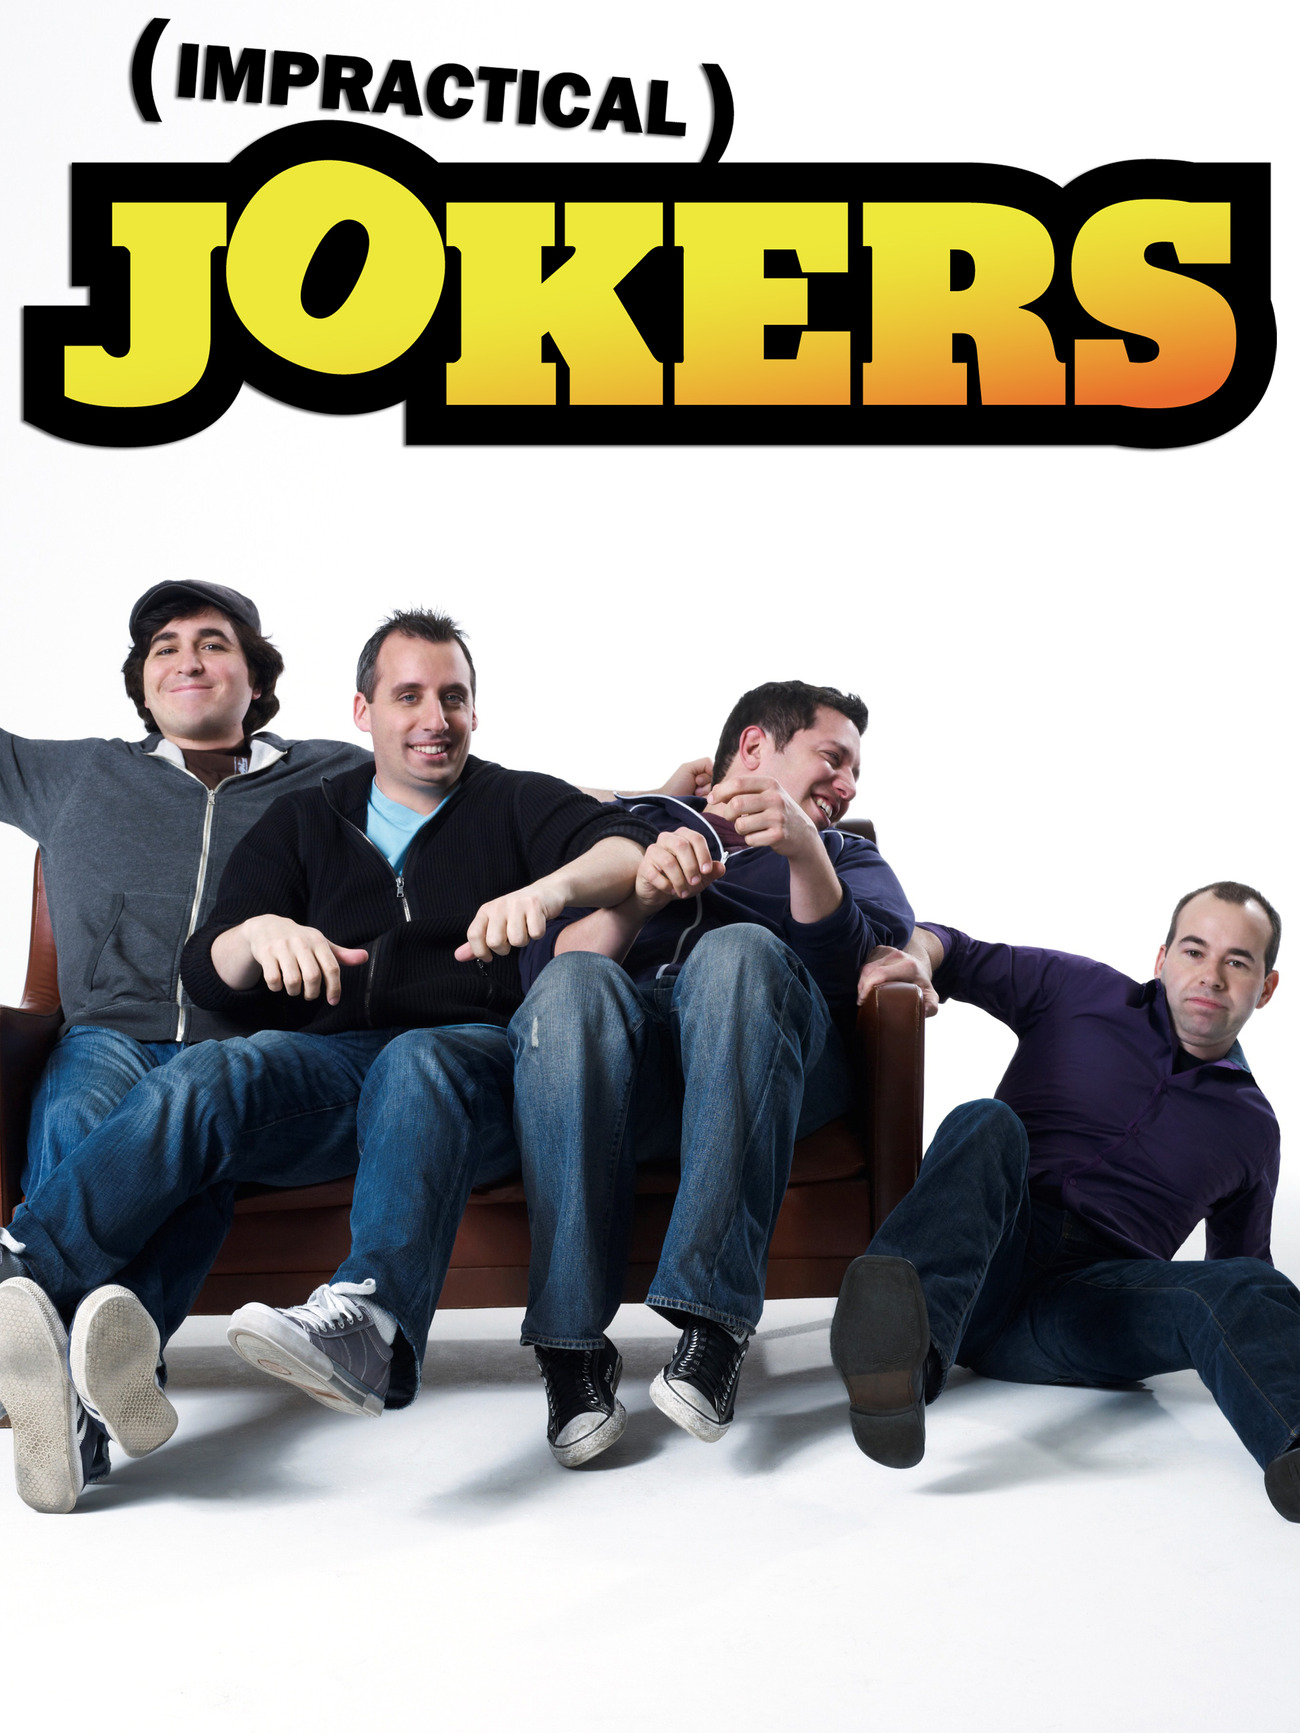 Impractical Jokers The Movie Tamil Dubbed TamilRockers